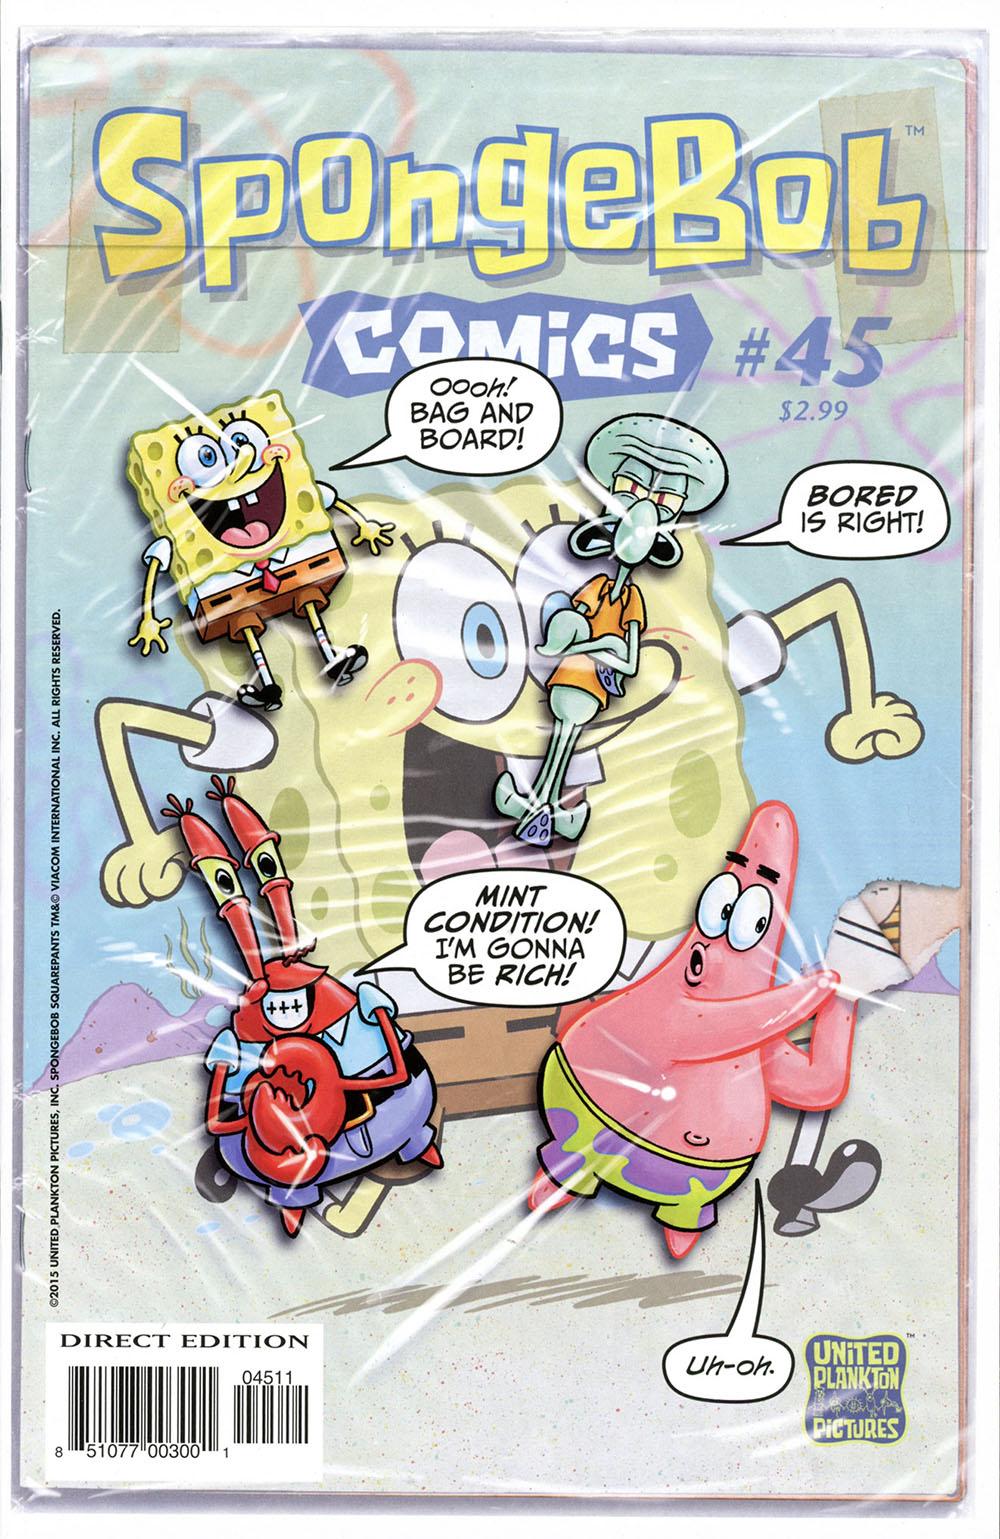 spongebob comics viewcomic reading comics online for free